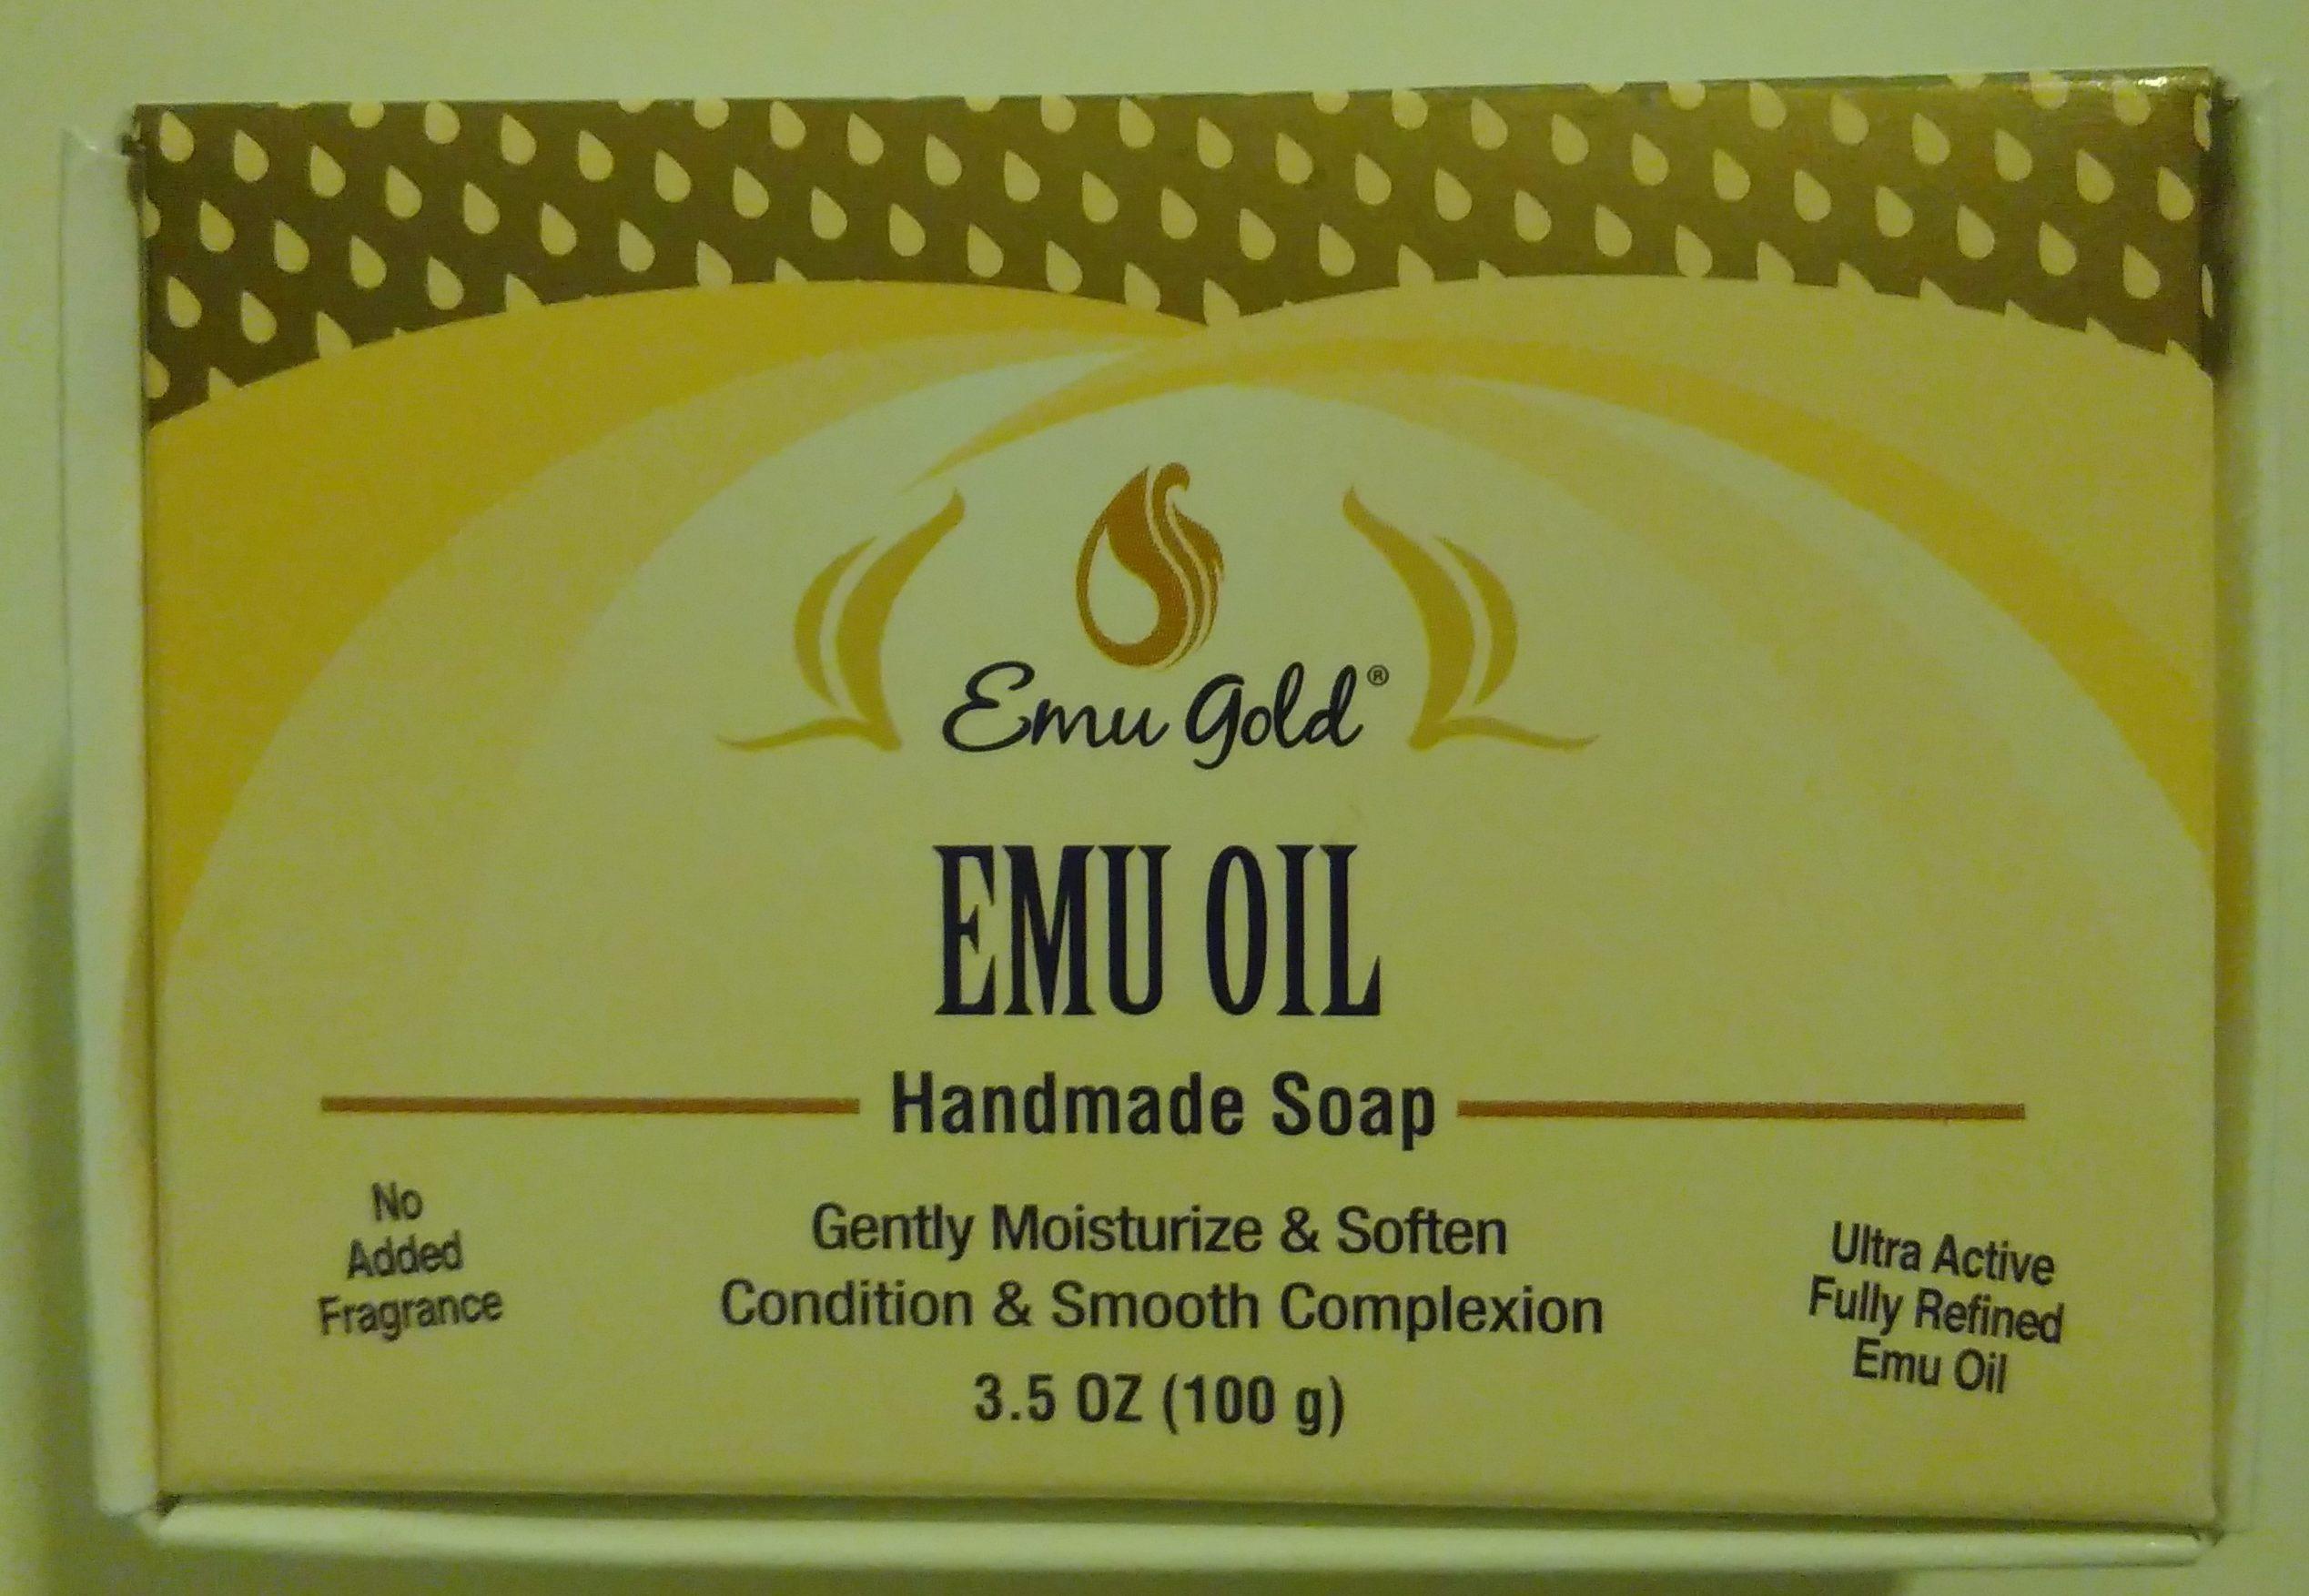 EMU OIL - Product - en